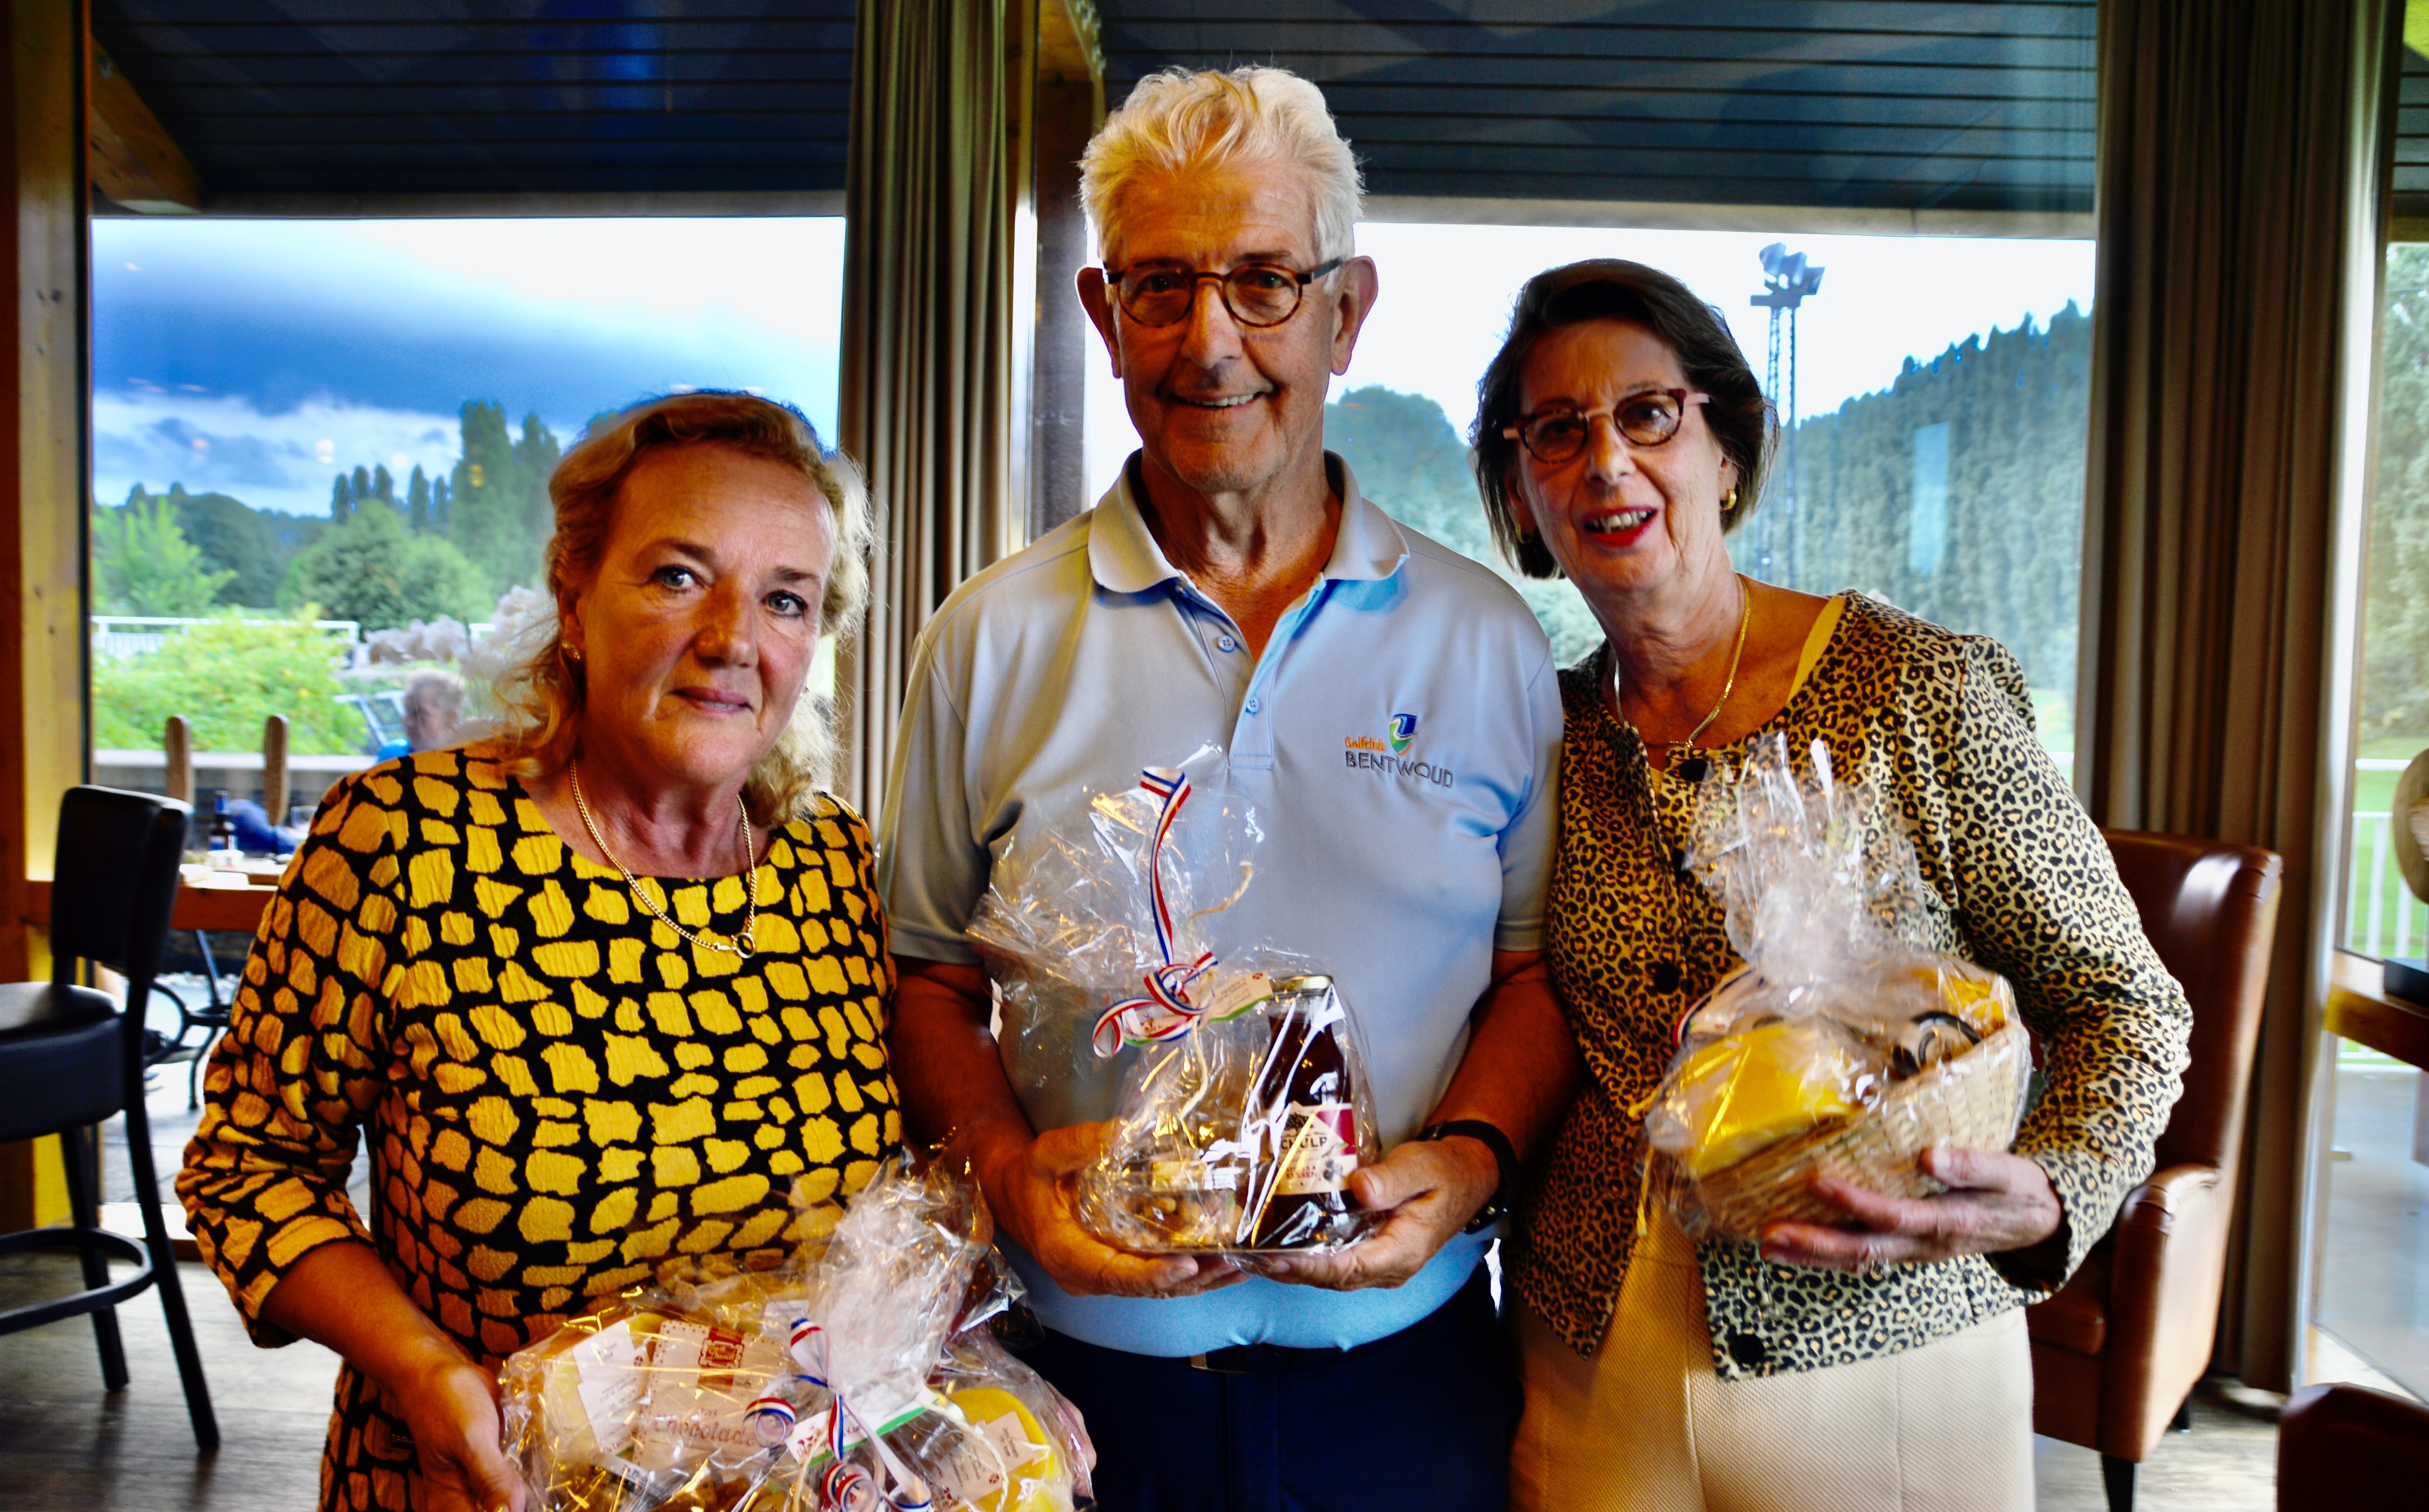 Seniorenuitje 2021 naar Rijswijkse Golfclub